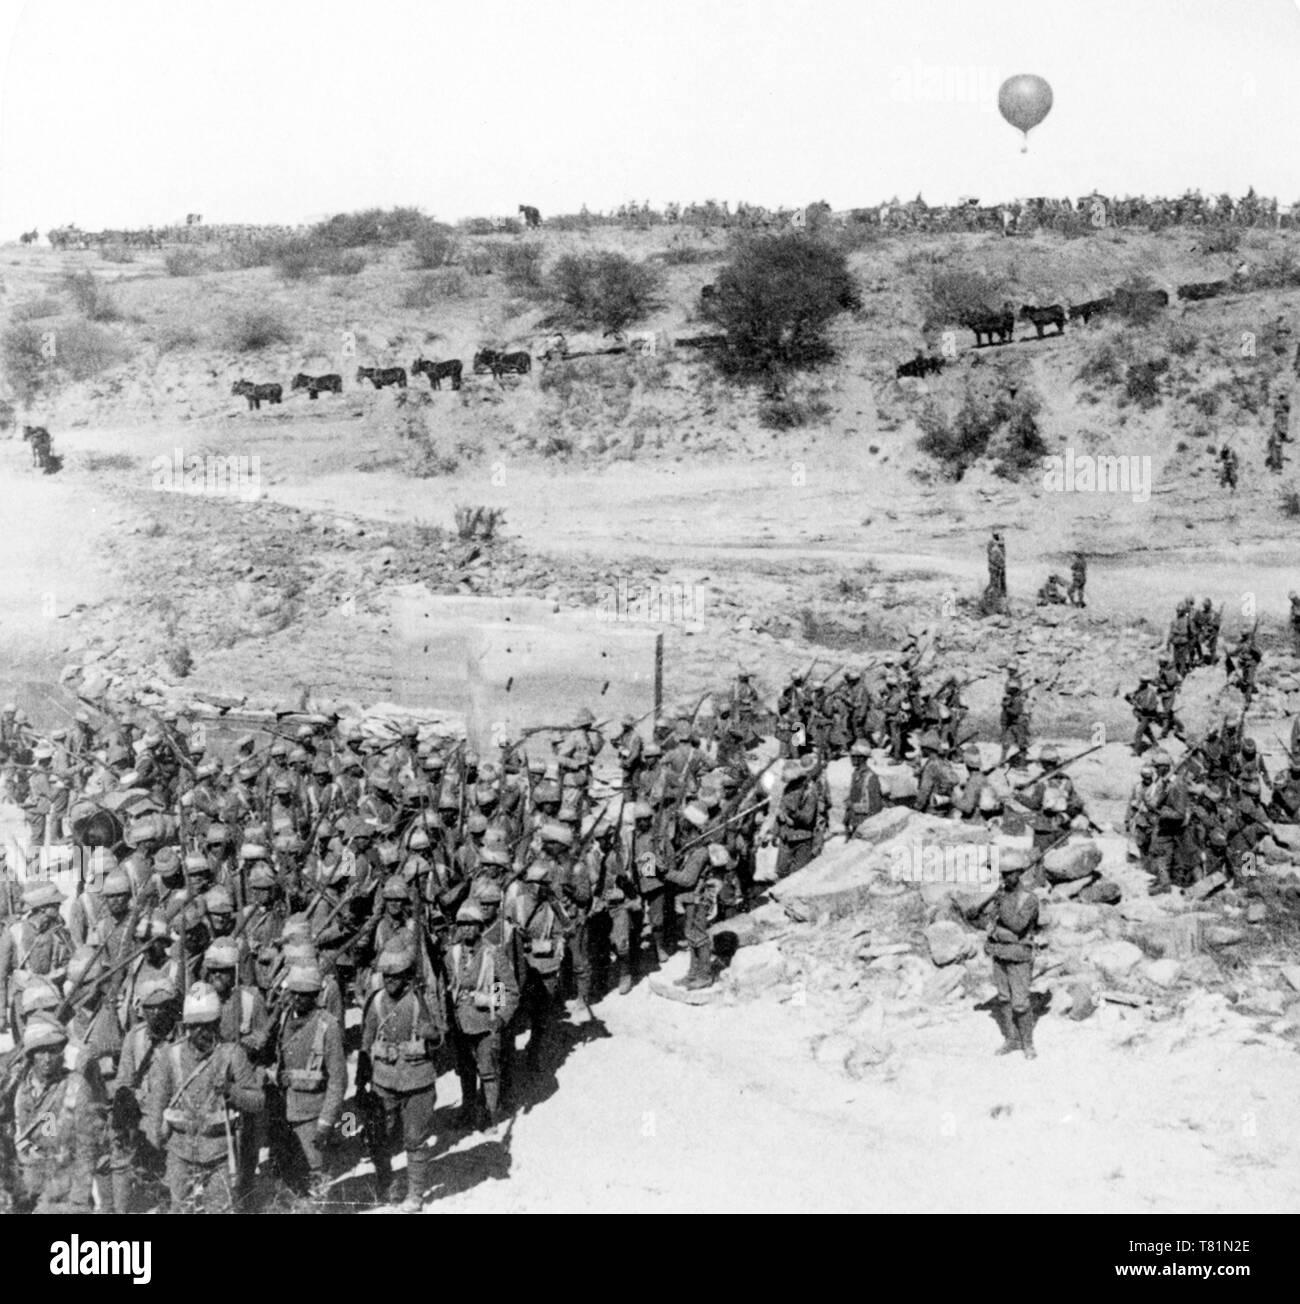 Boer War, British Army Cross Zand River - Stock Image